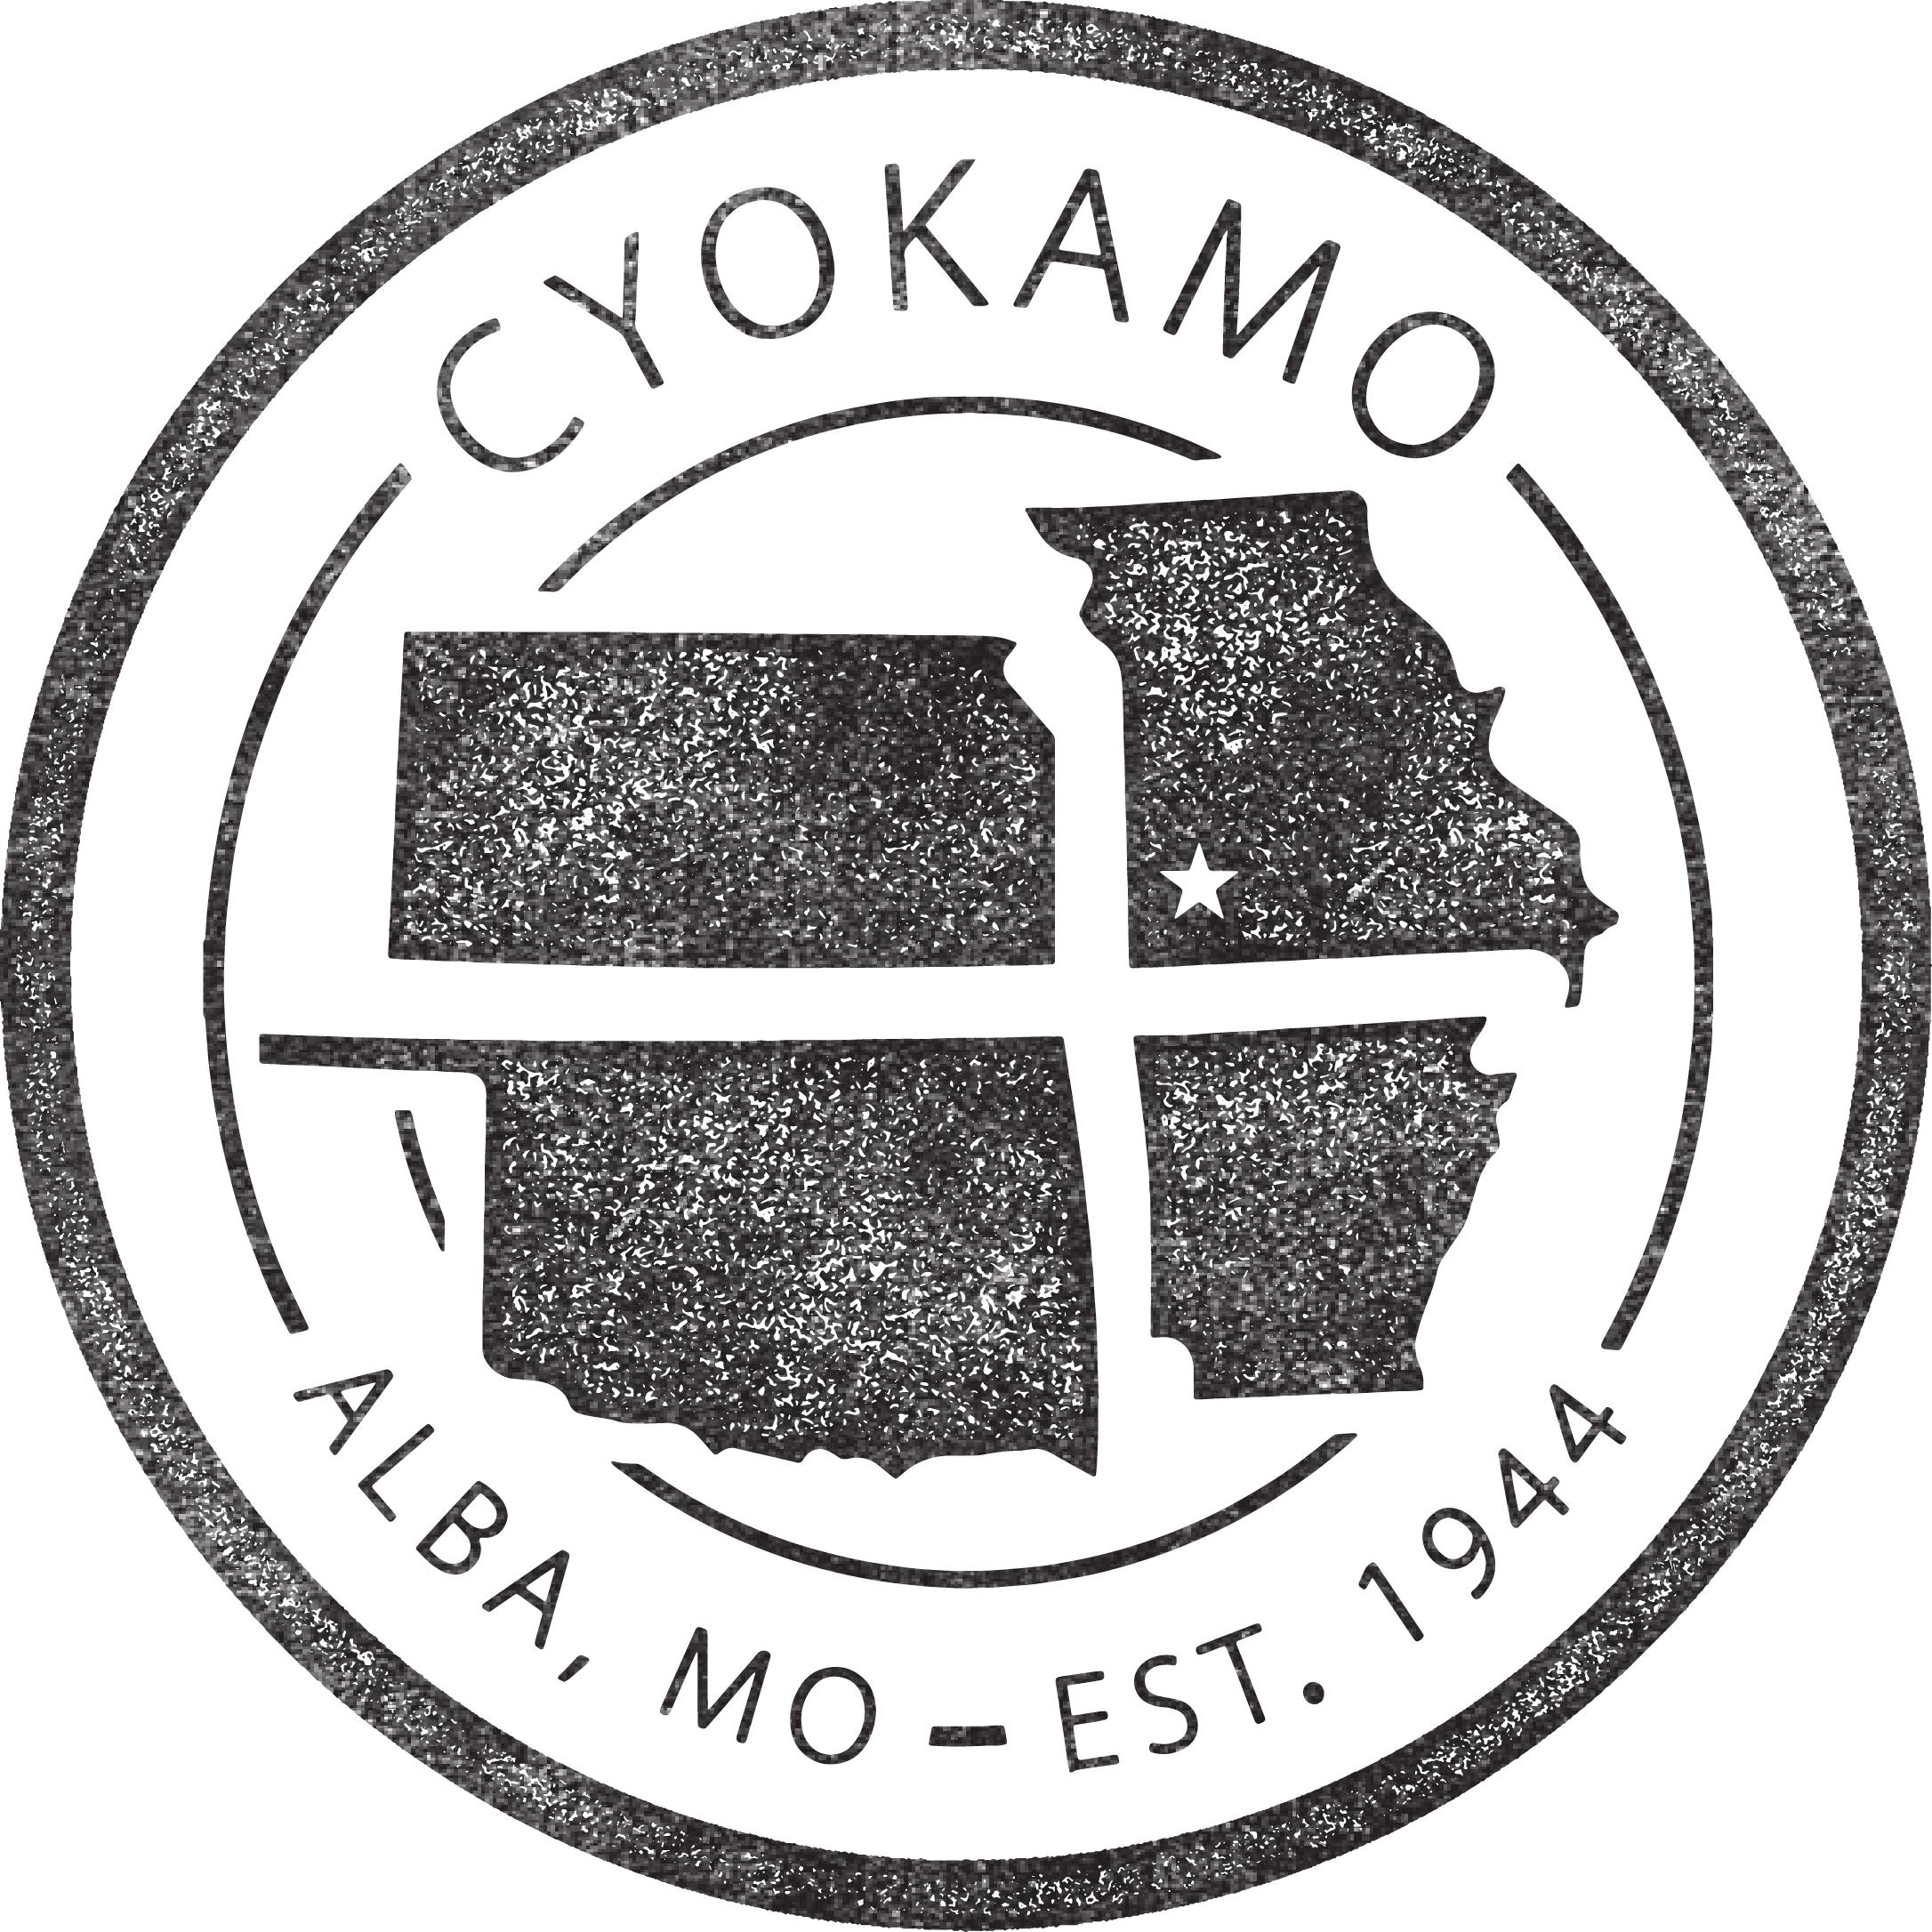 Cyokamo Logos -